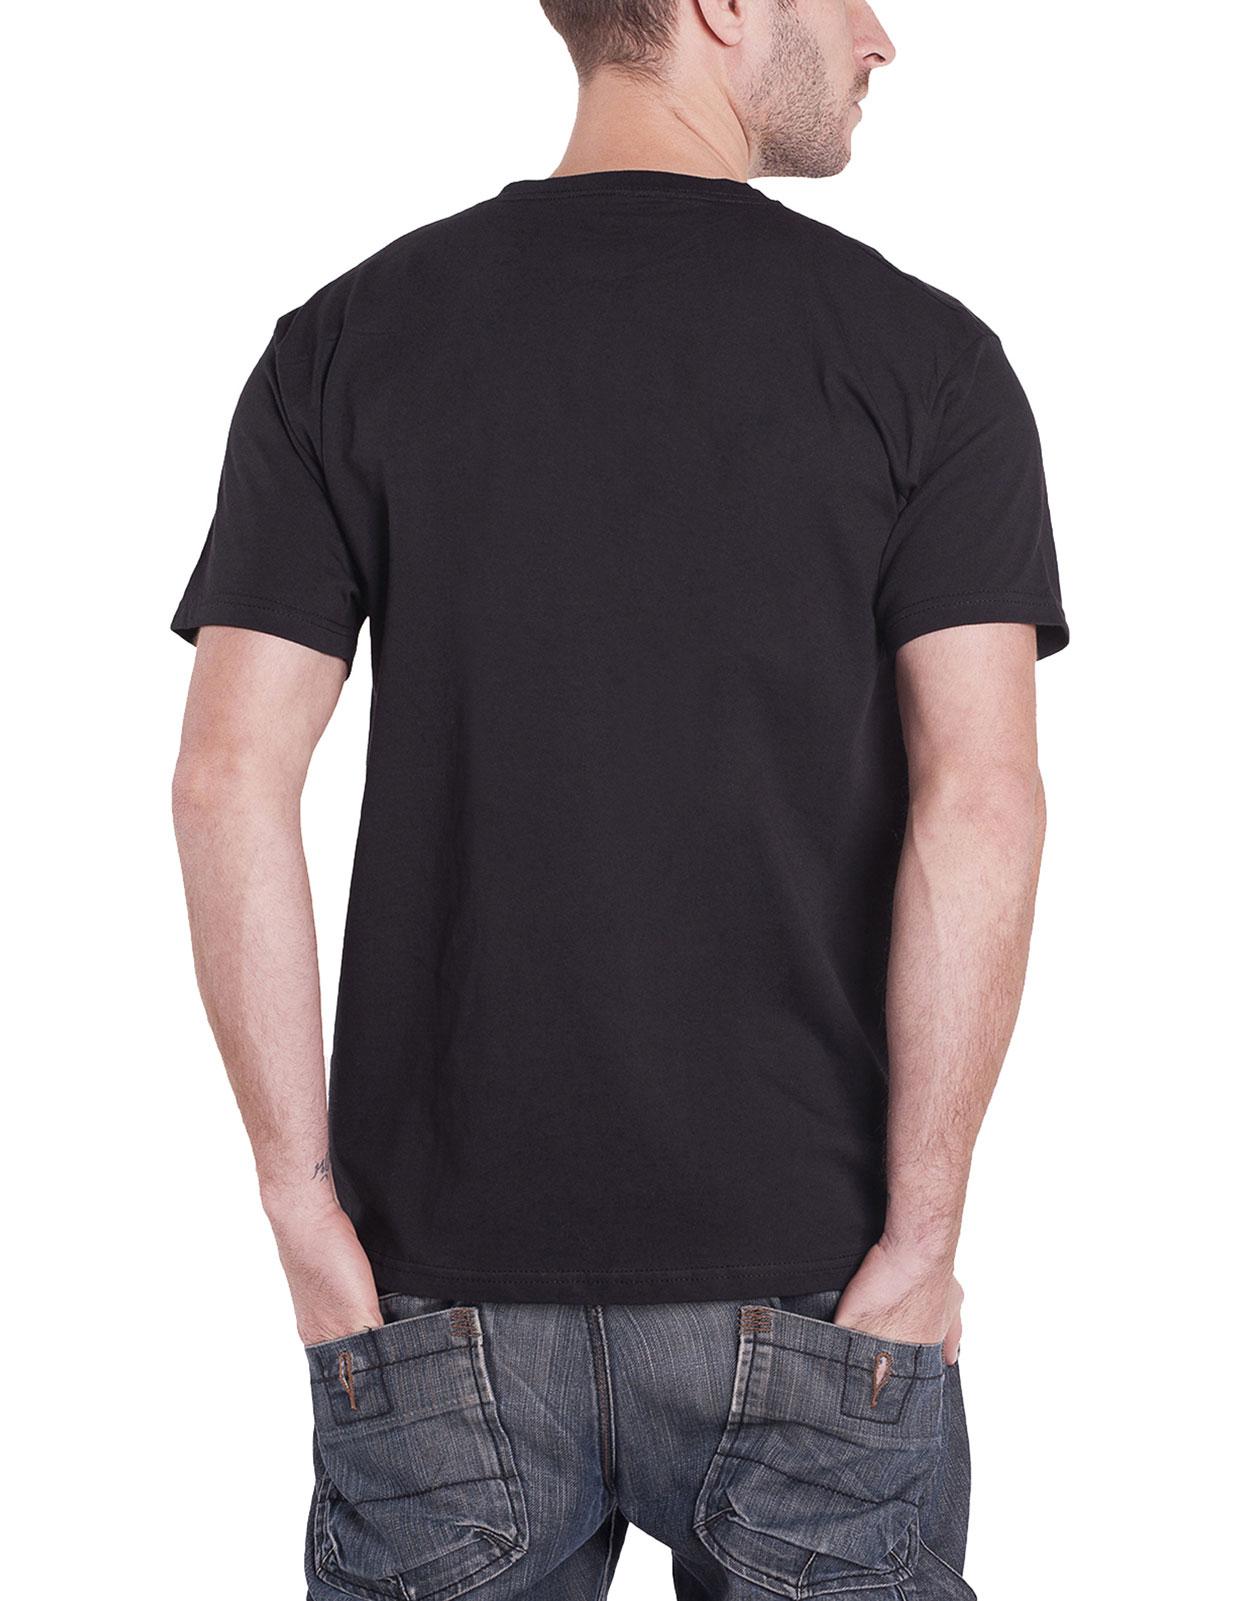 Camiseta-Last-Jedi-De-Star-Wars-Movie-Poster-porgs-Guardia-pretoriana-oficial-para-hombre miniatura 7